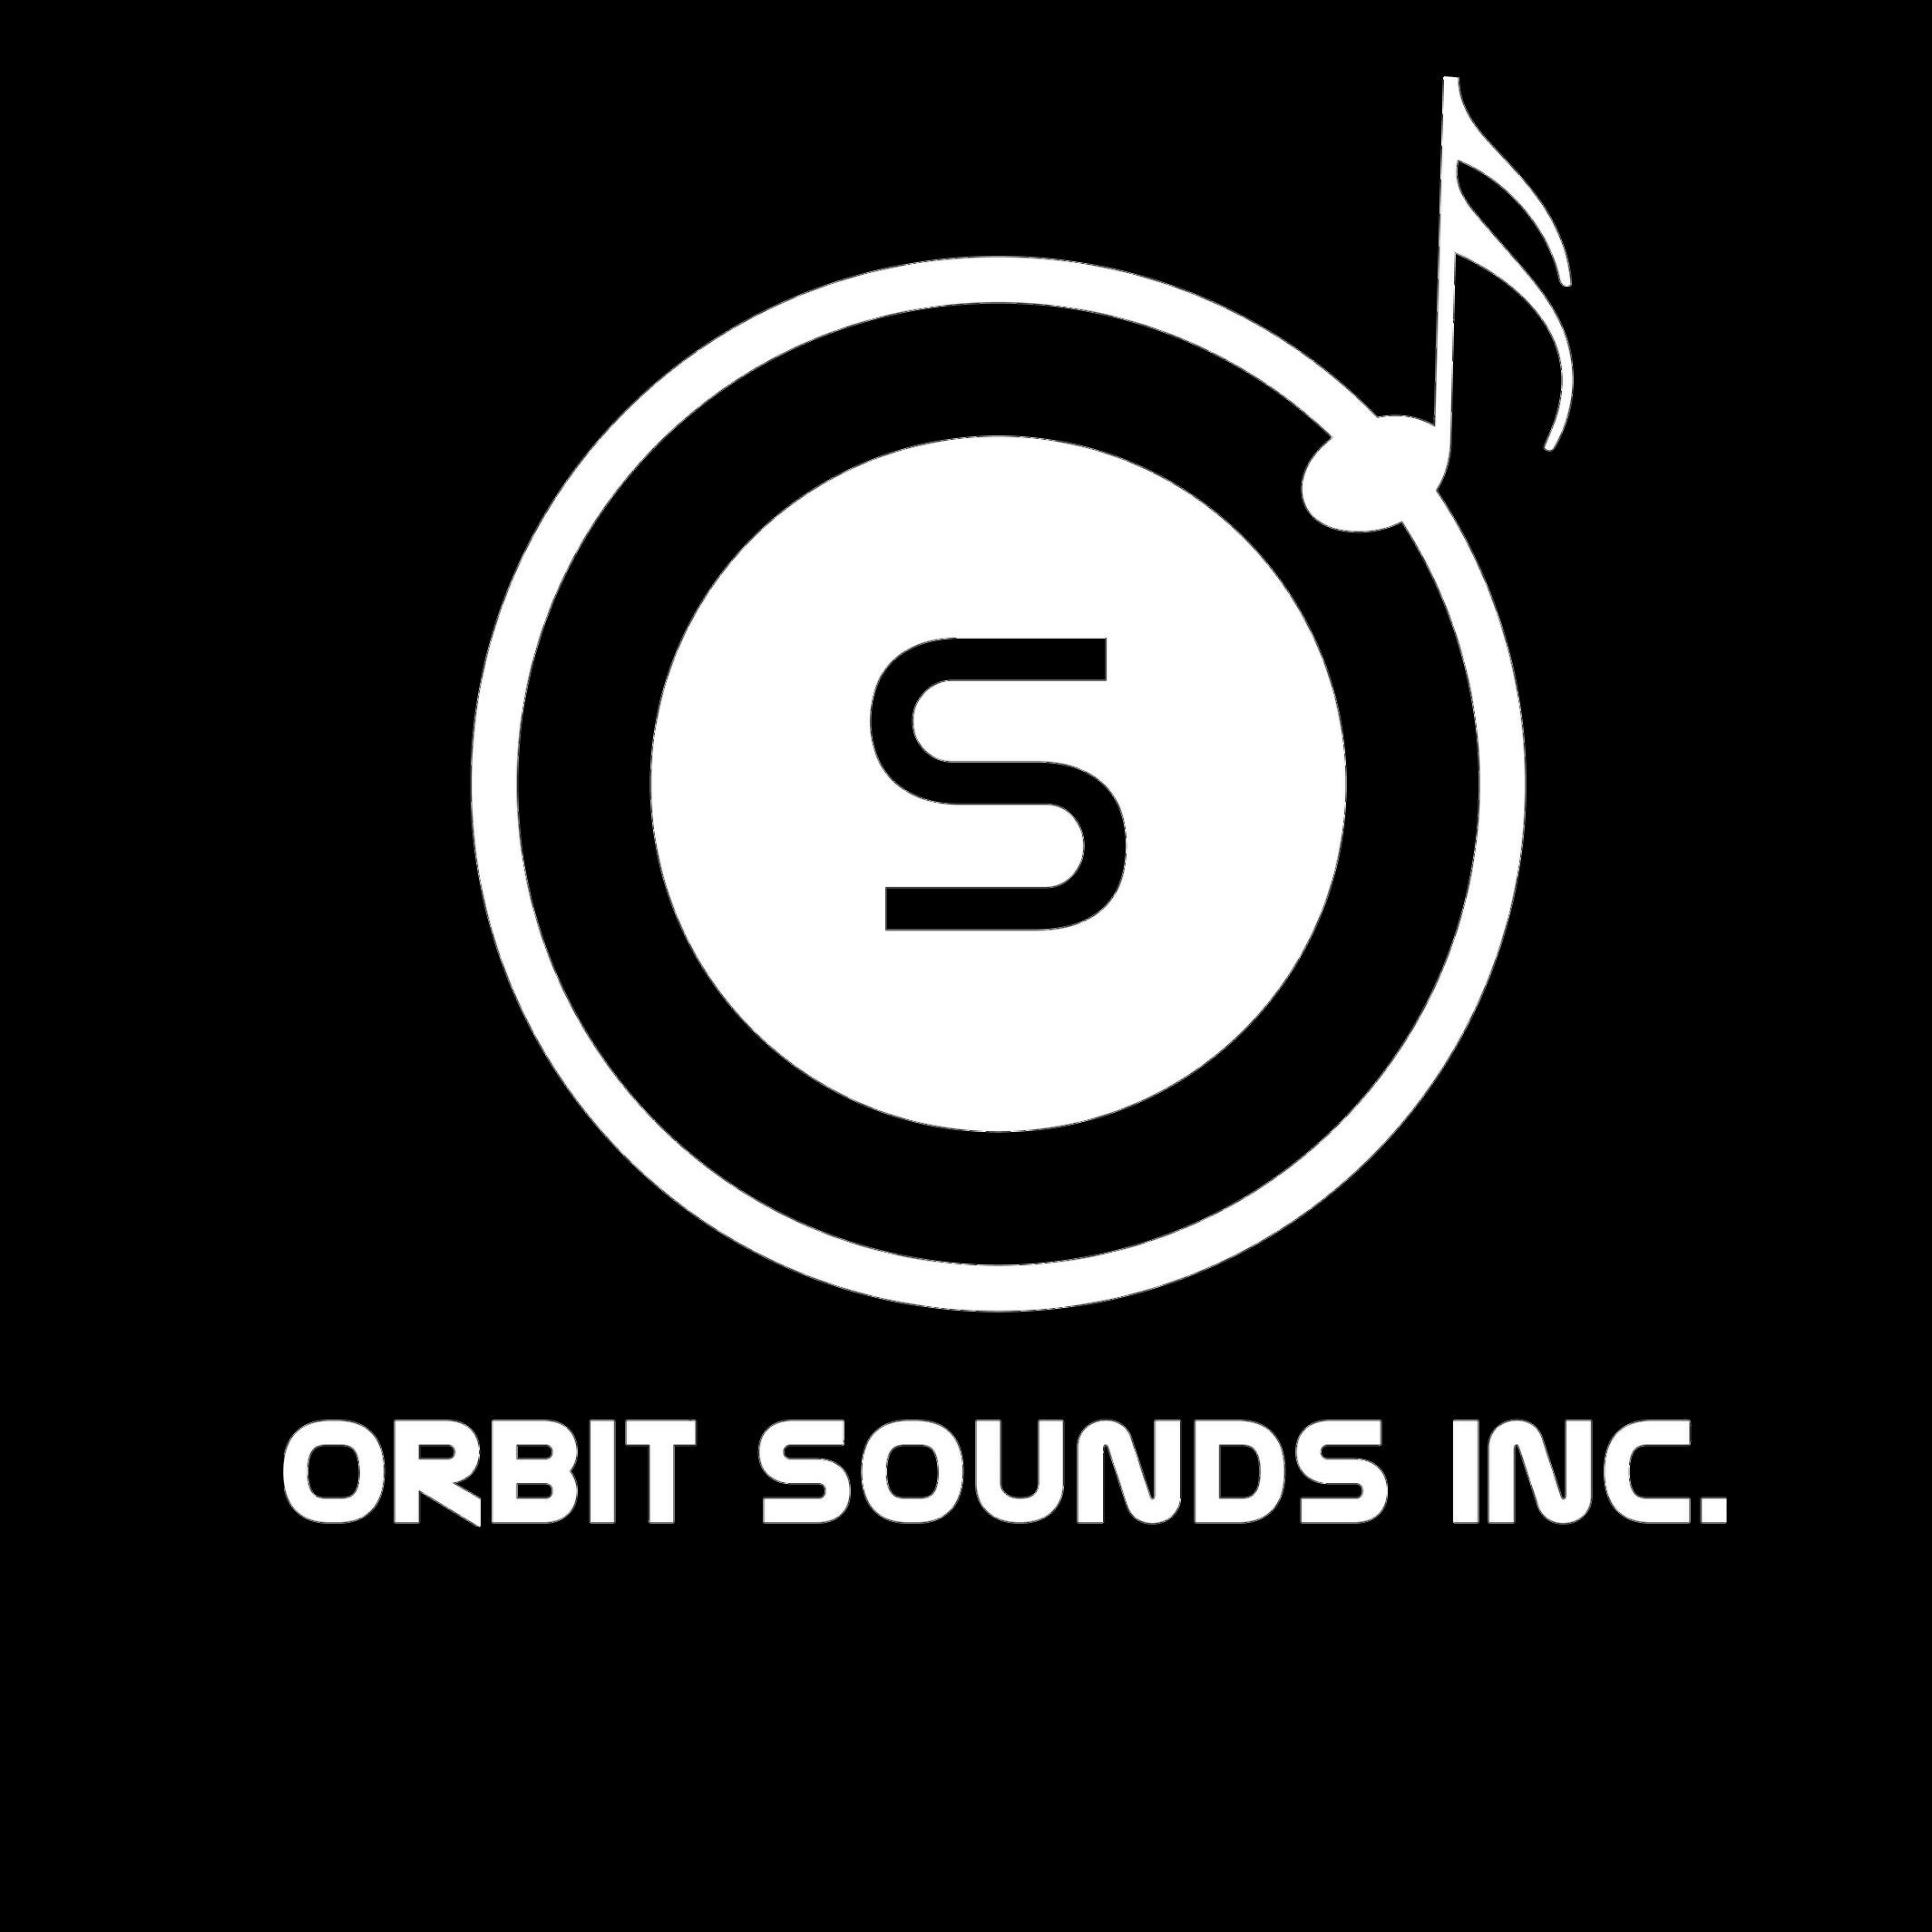 Orbit Sounds PR